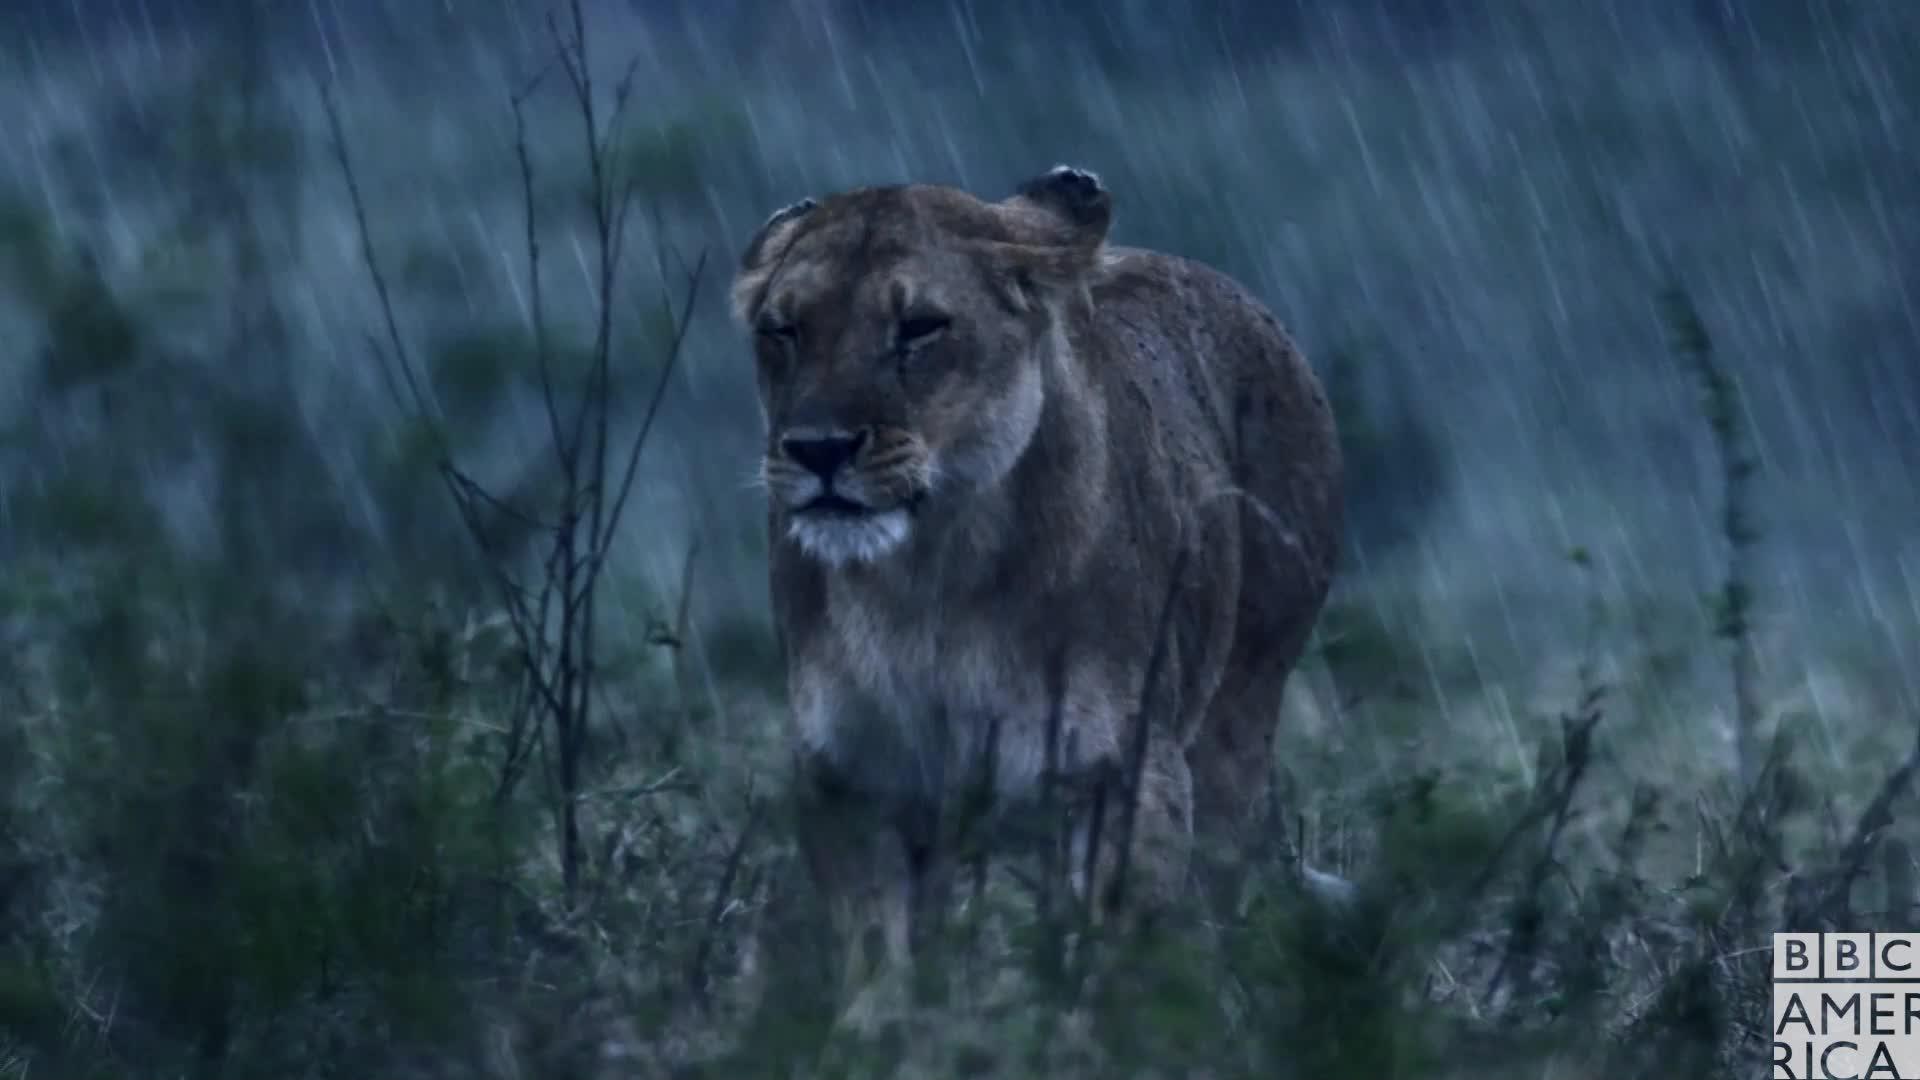 animal, animals, bbc america, bbc america: dynasties, dynasties, lion, lions, rain, raining, success, swag, walk, walking, yolo, Dynasties Lioness Charm Swag GIFs